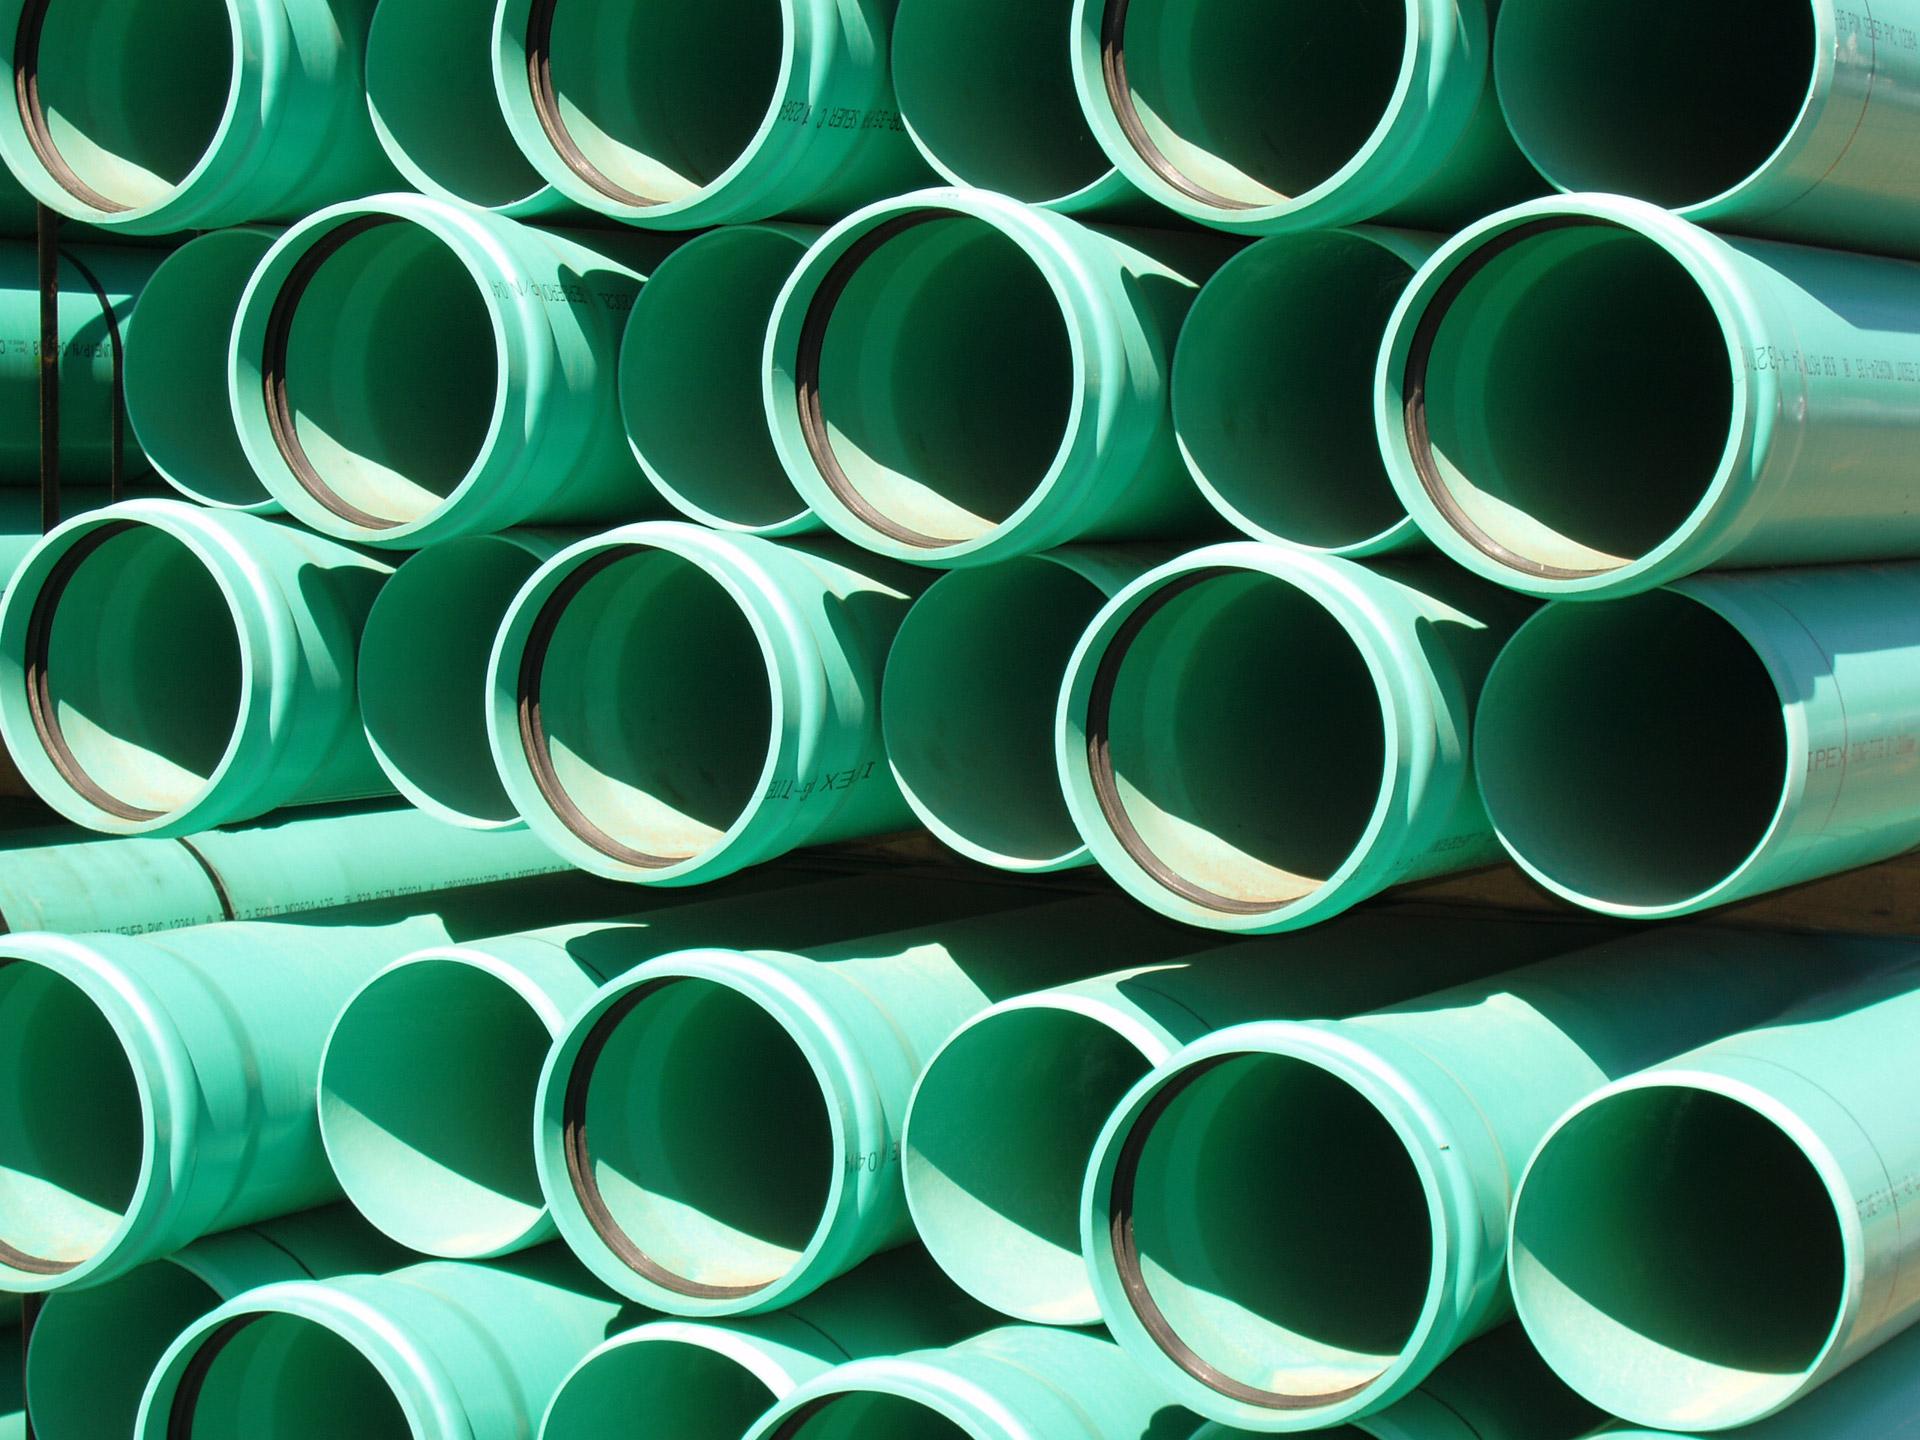 Green culvert pipes 1350216908krw